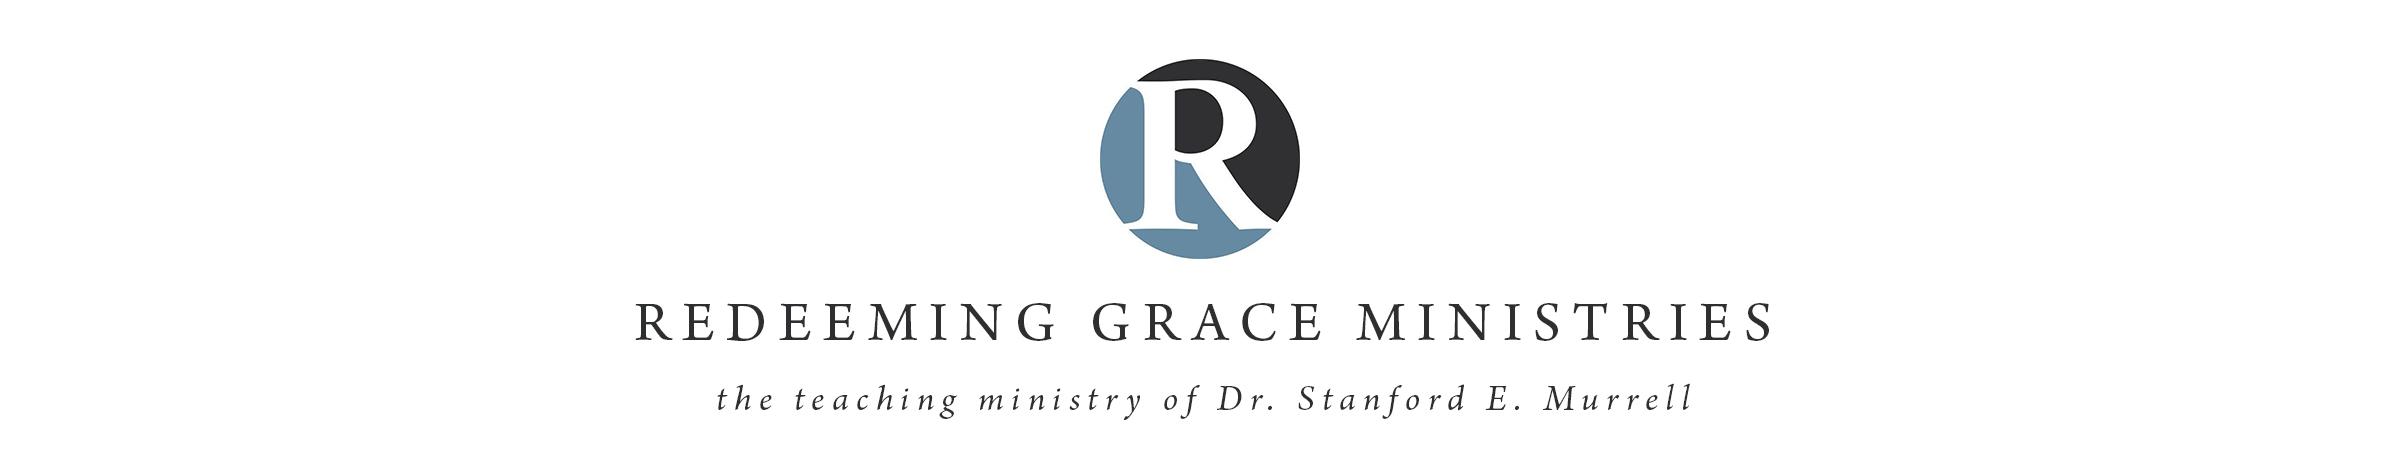 Redeeming Grace Ministries